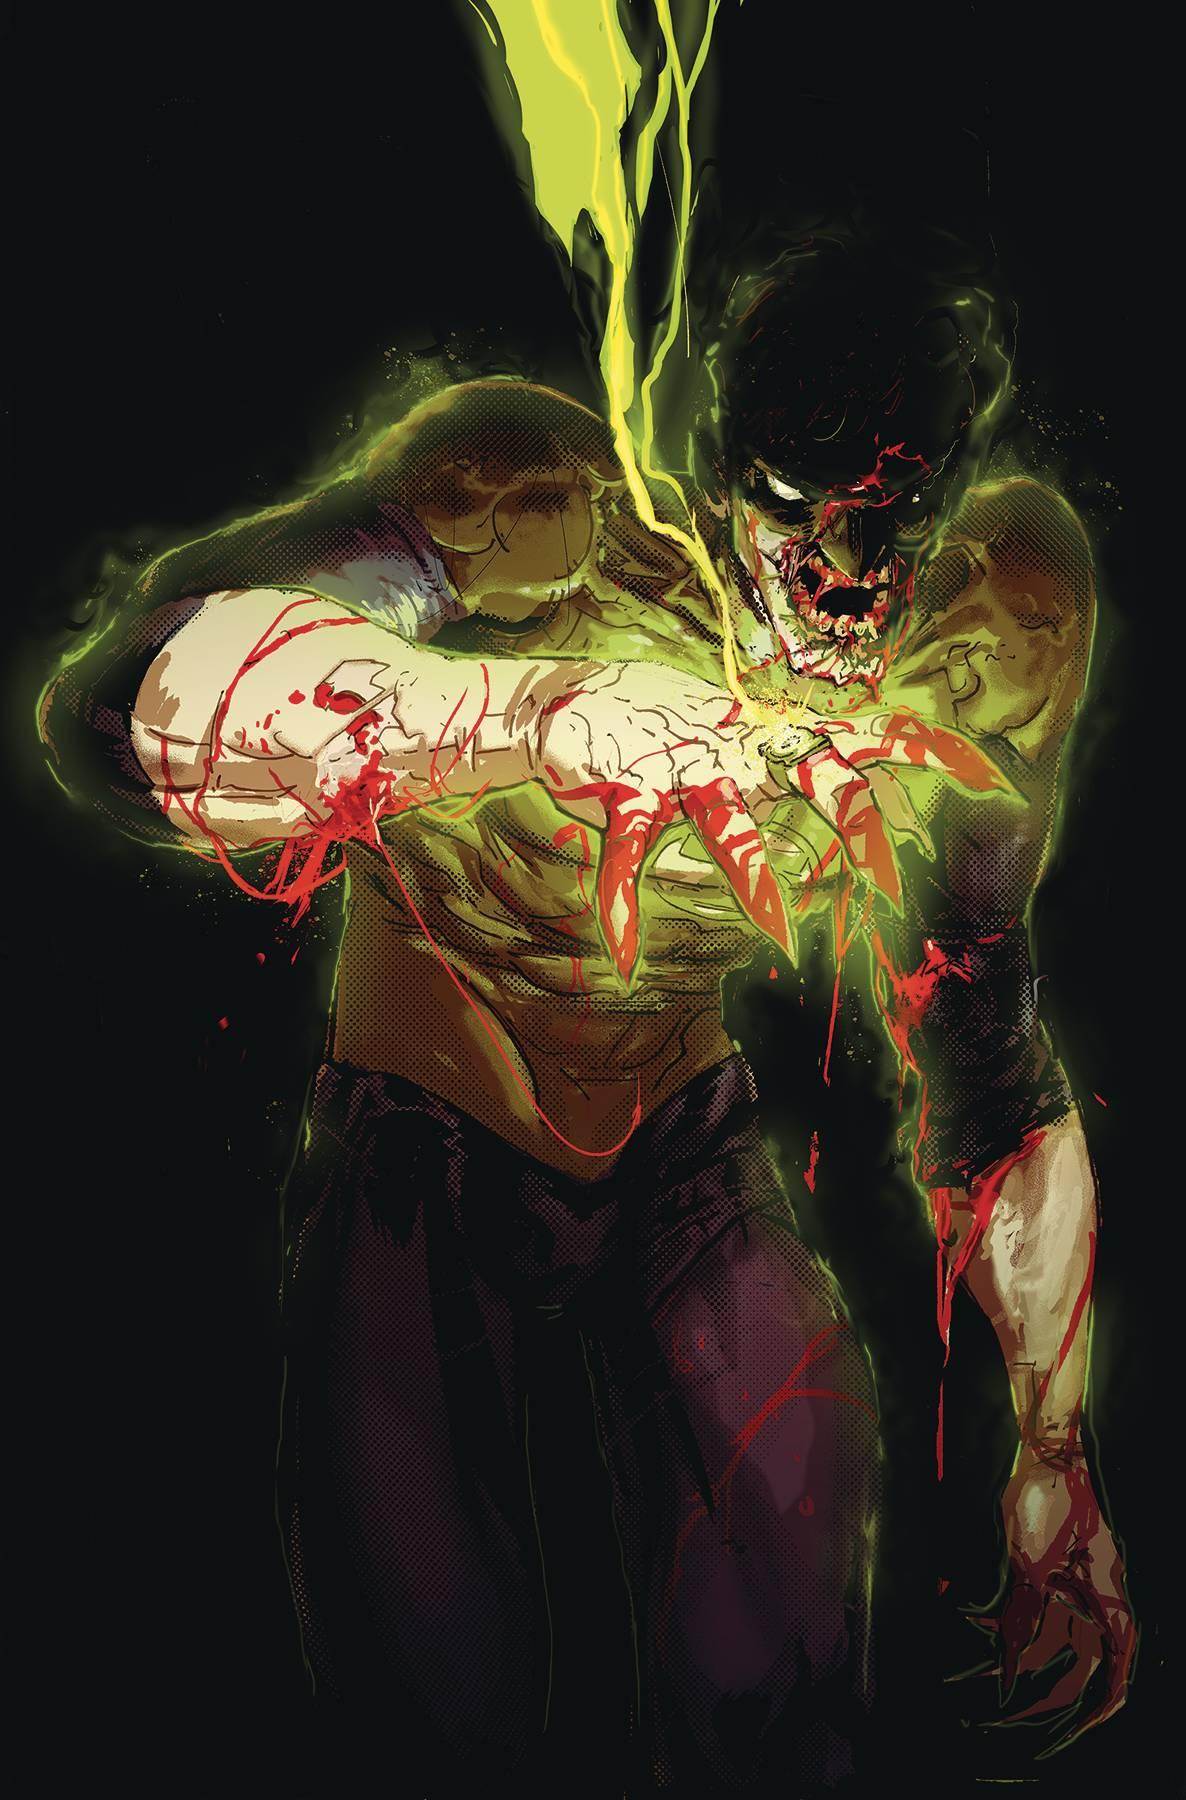 The Green Lantern Vol 1 12 Textless Variant.jpg